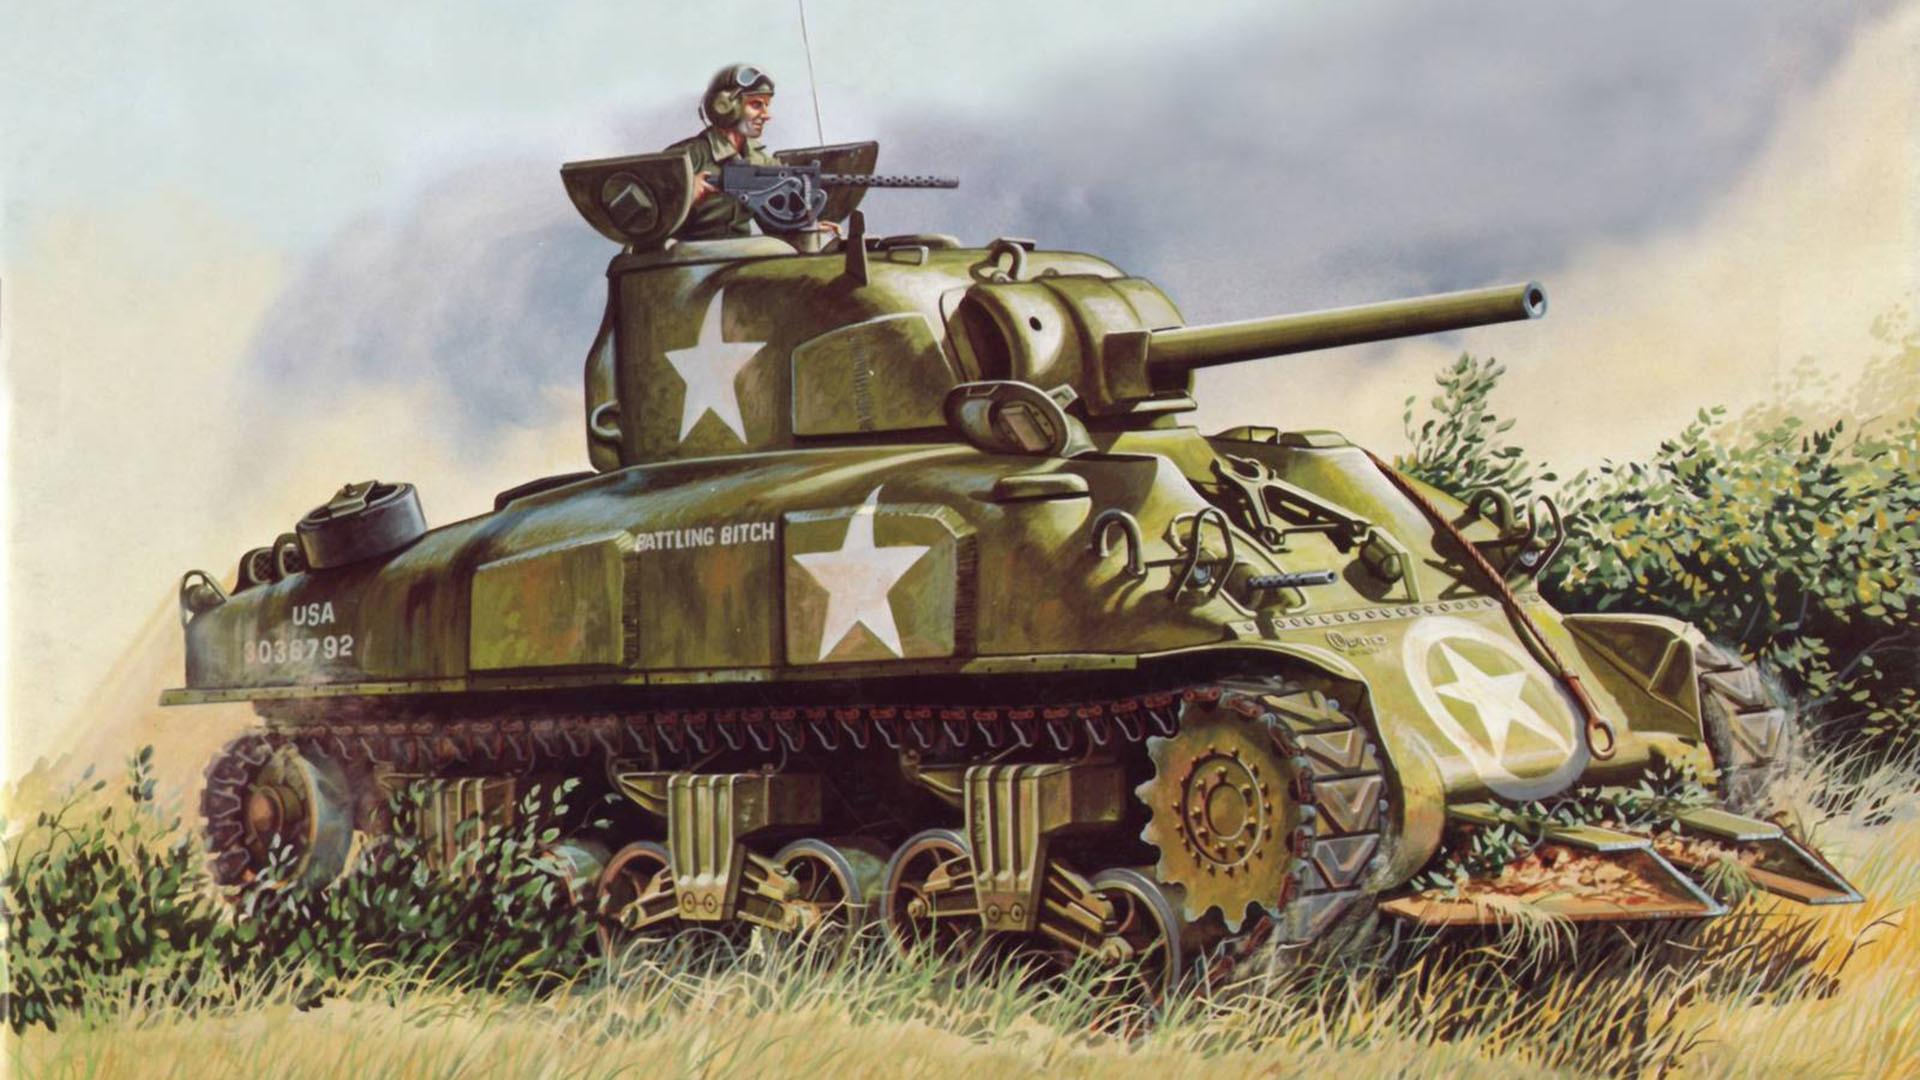 Res: 1920x1080, Sherman tank m4 sherman the main american medium tank of world war